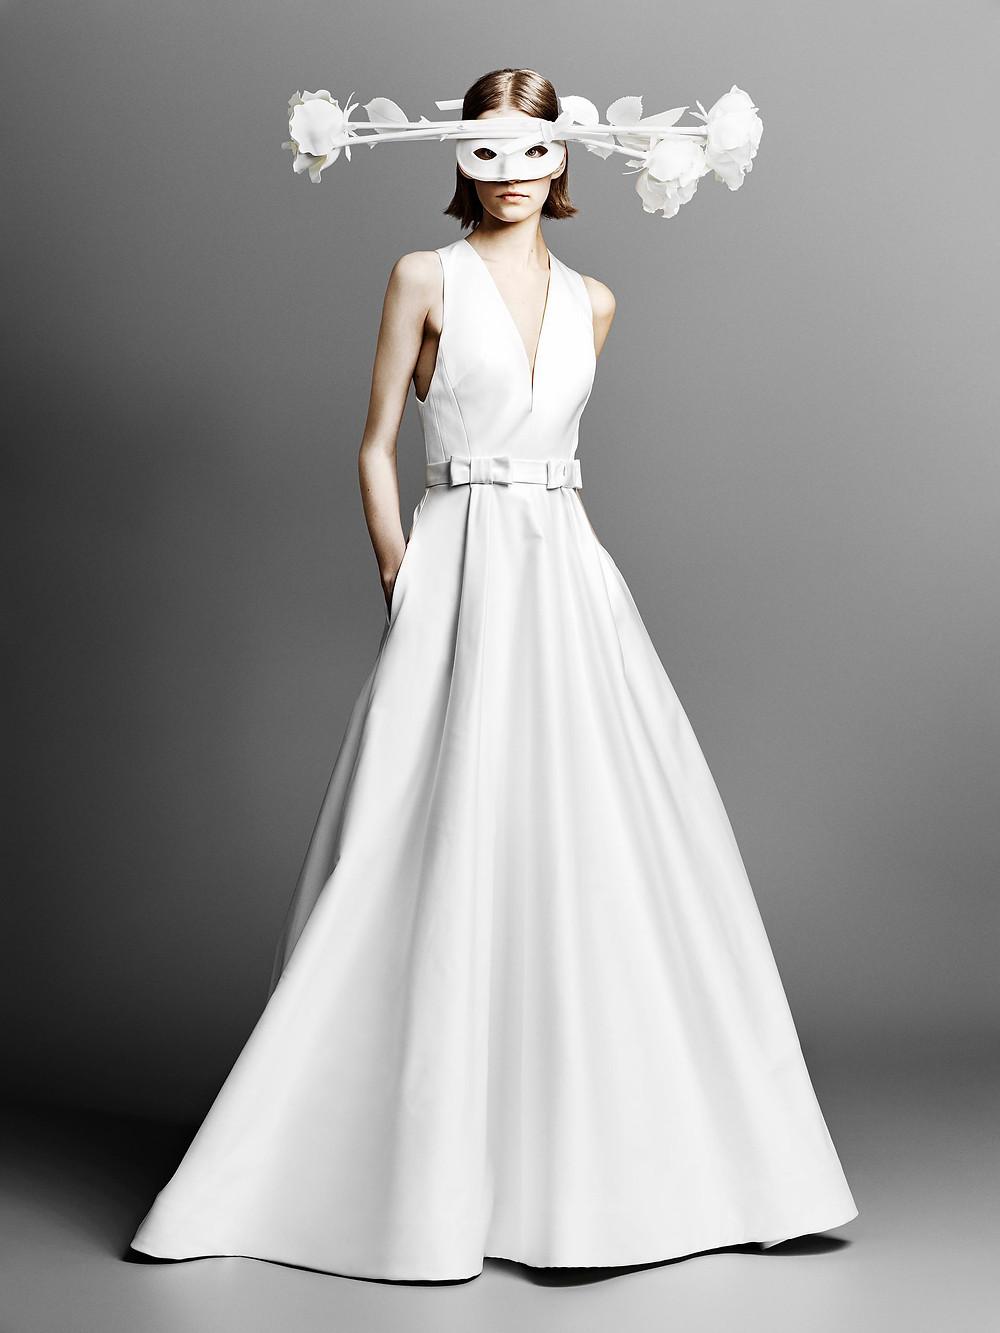 A Viktor & Rolf simple crepe A-line wedding dress with pockets